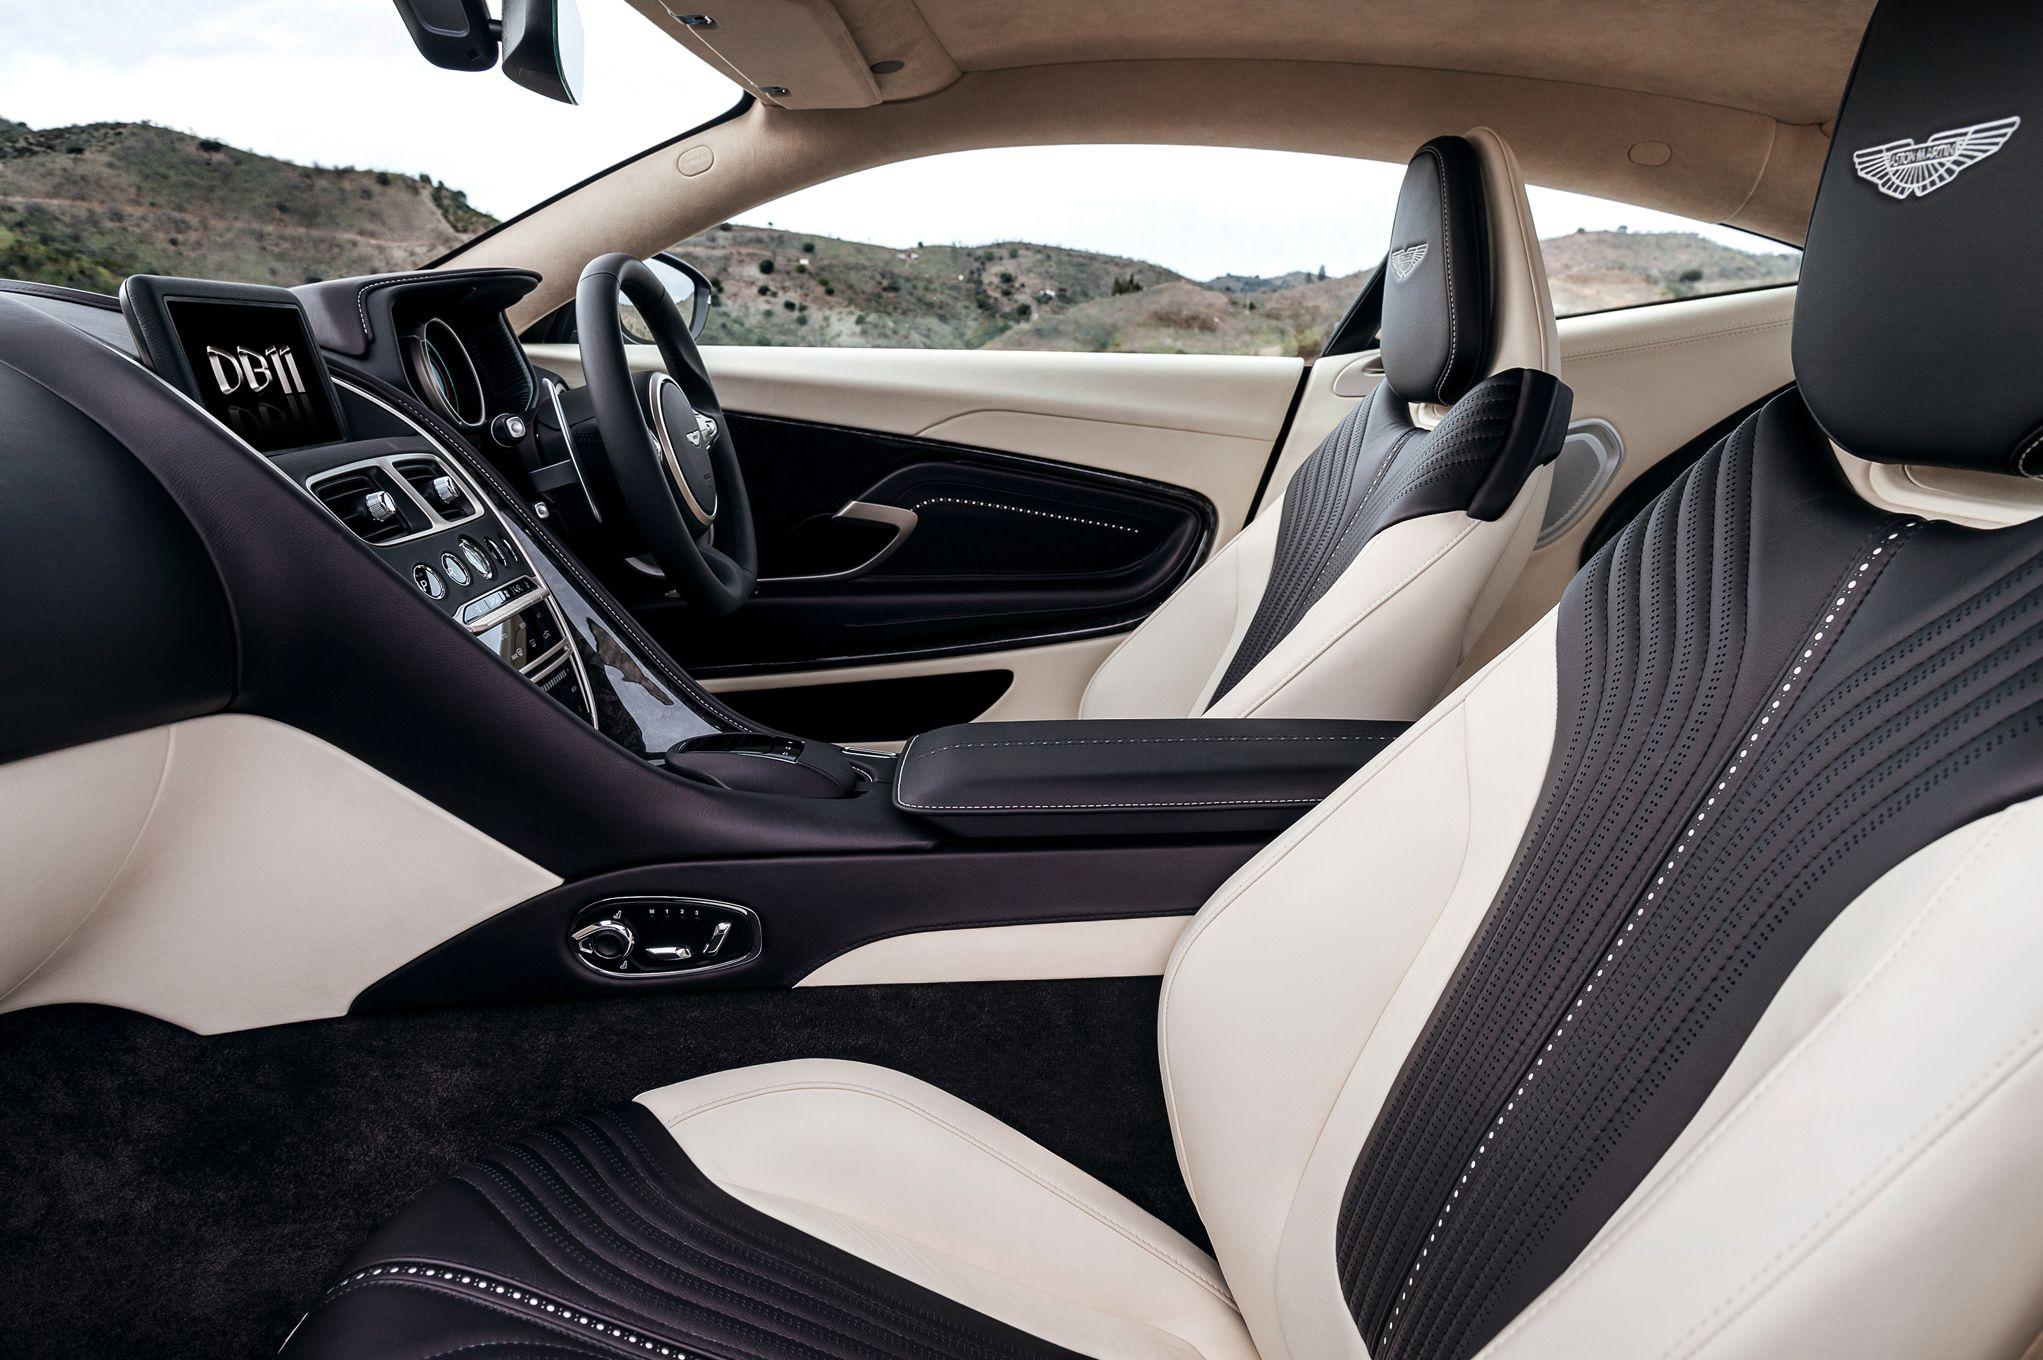 aston martin db11, interior seats | transfer | pinterest | aston